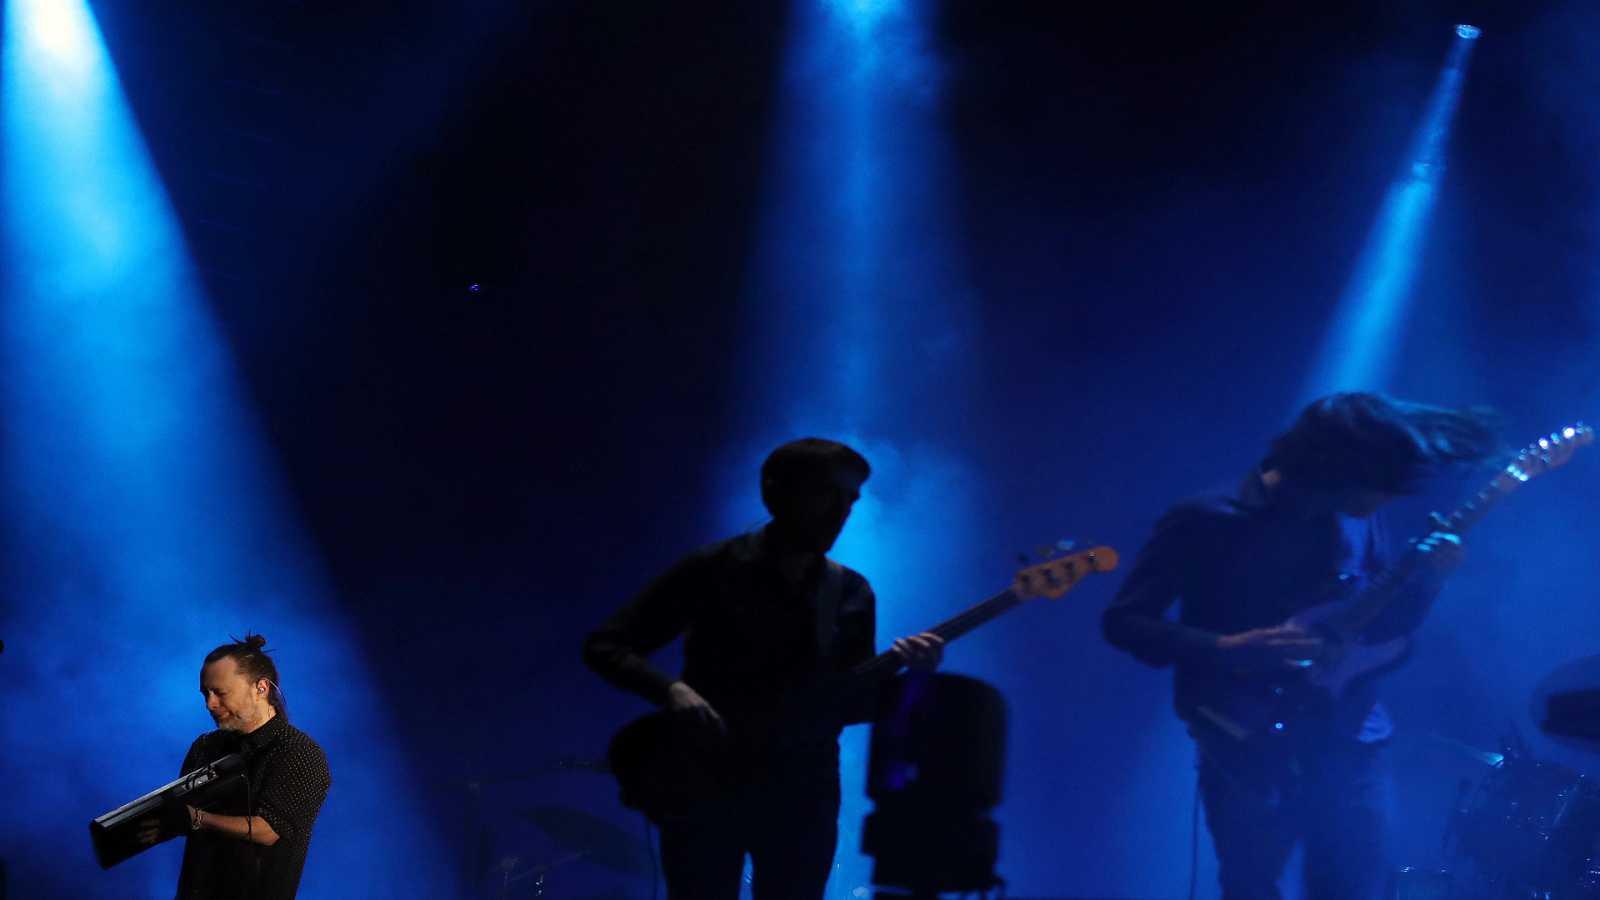 Memoria Beatle - Julian Lennon y Nuno Bettencourt - 27/01/21 - Escuchar ahora